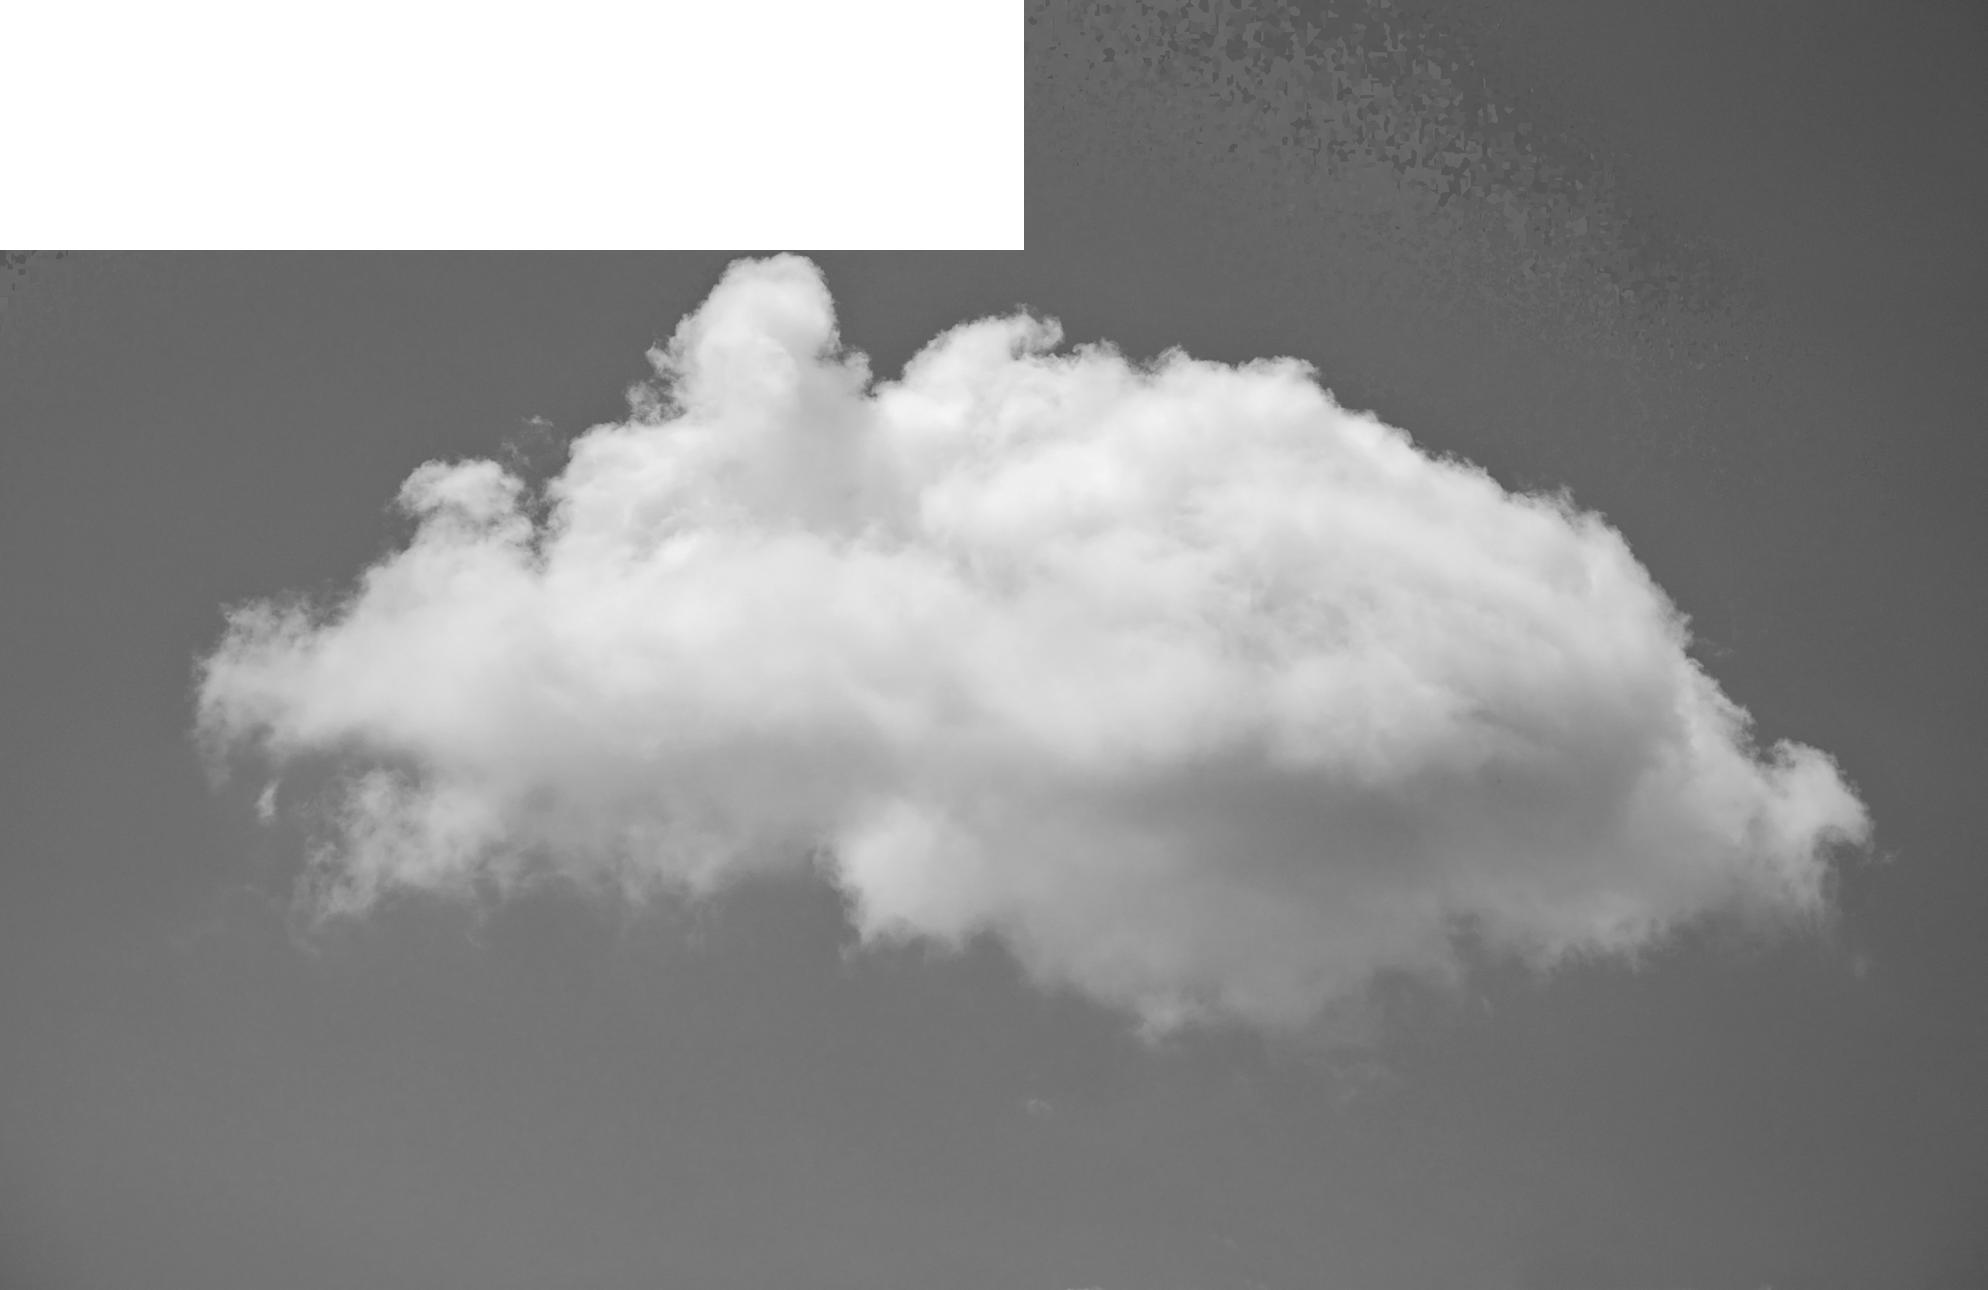 cloud PNG image - Cloud HD PNG